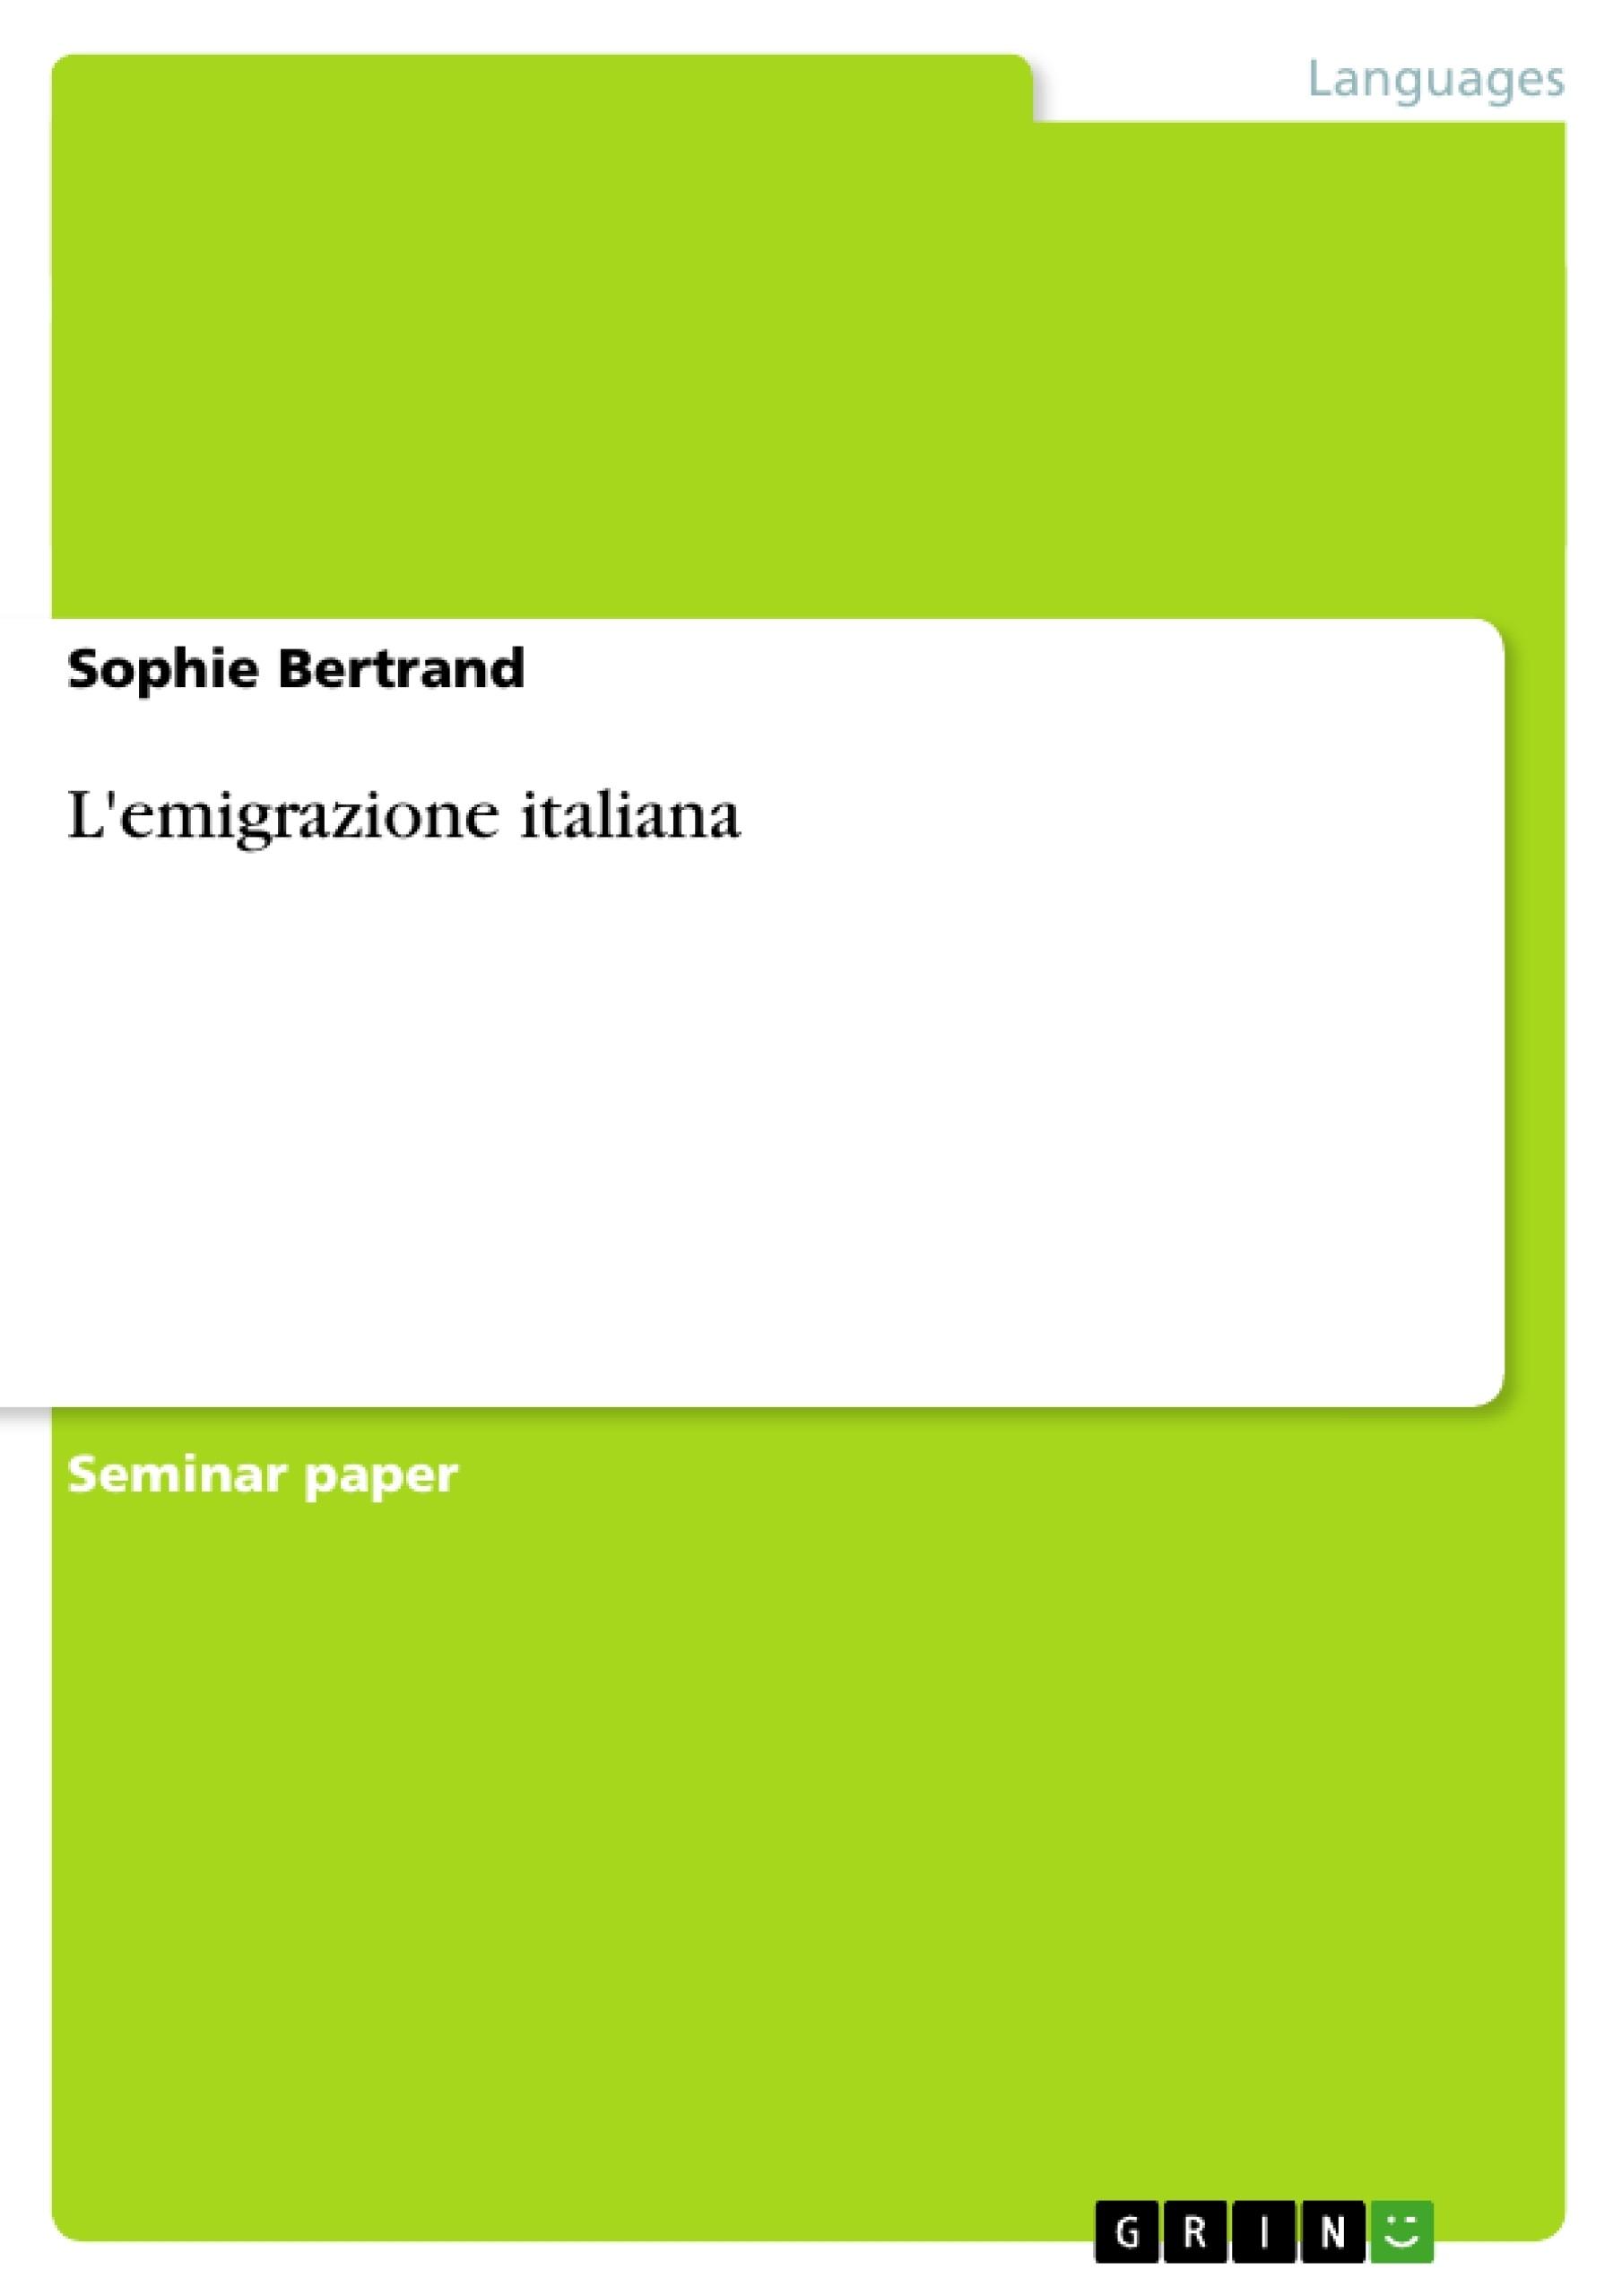 Title: L'emigrazione italiana